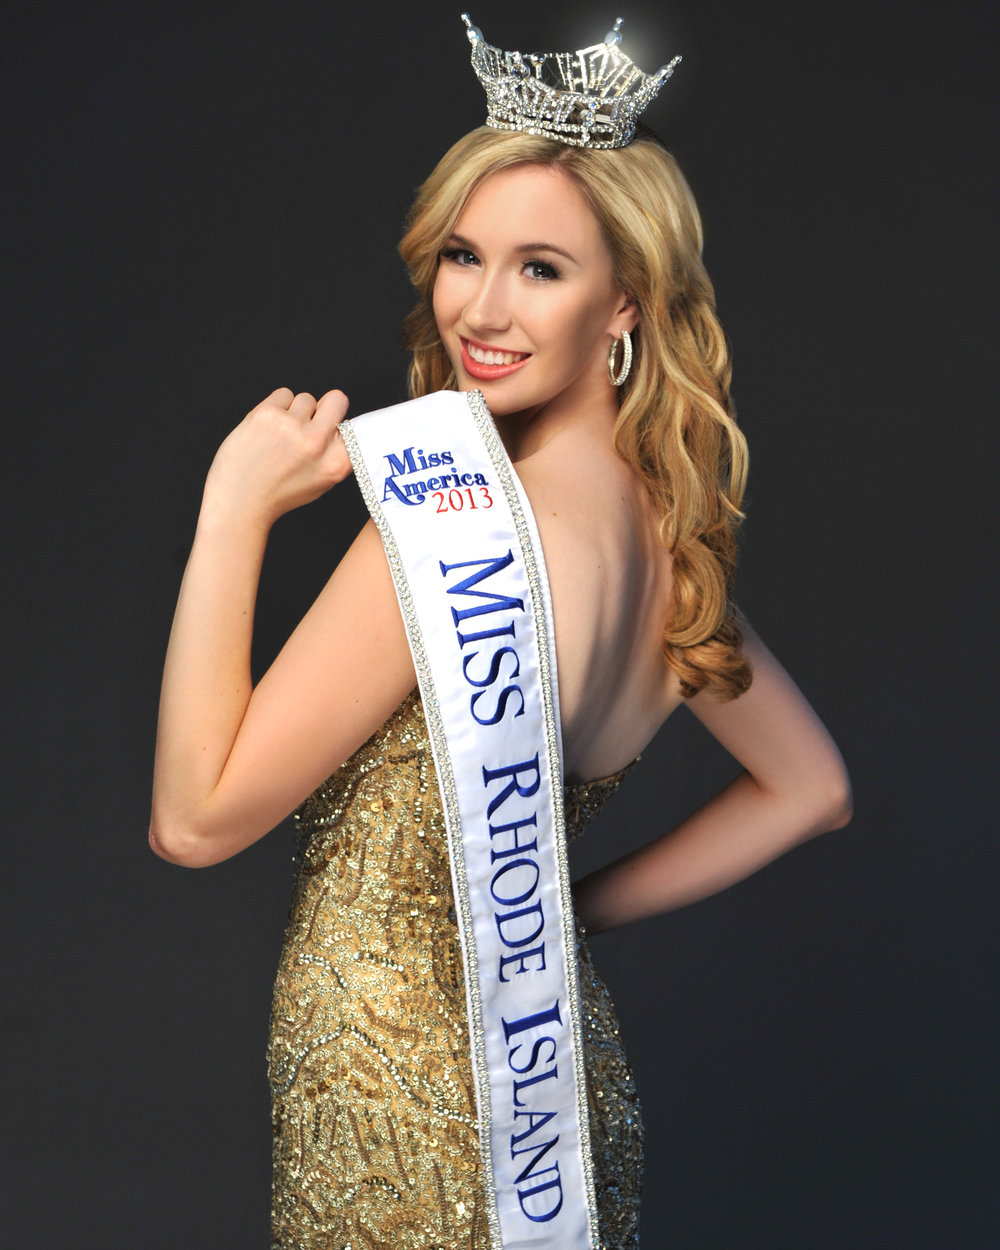 Jessica Marfeo  Miss Rhode Island 2013  Quality of Life Finalist